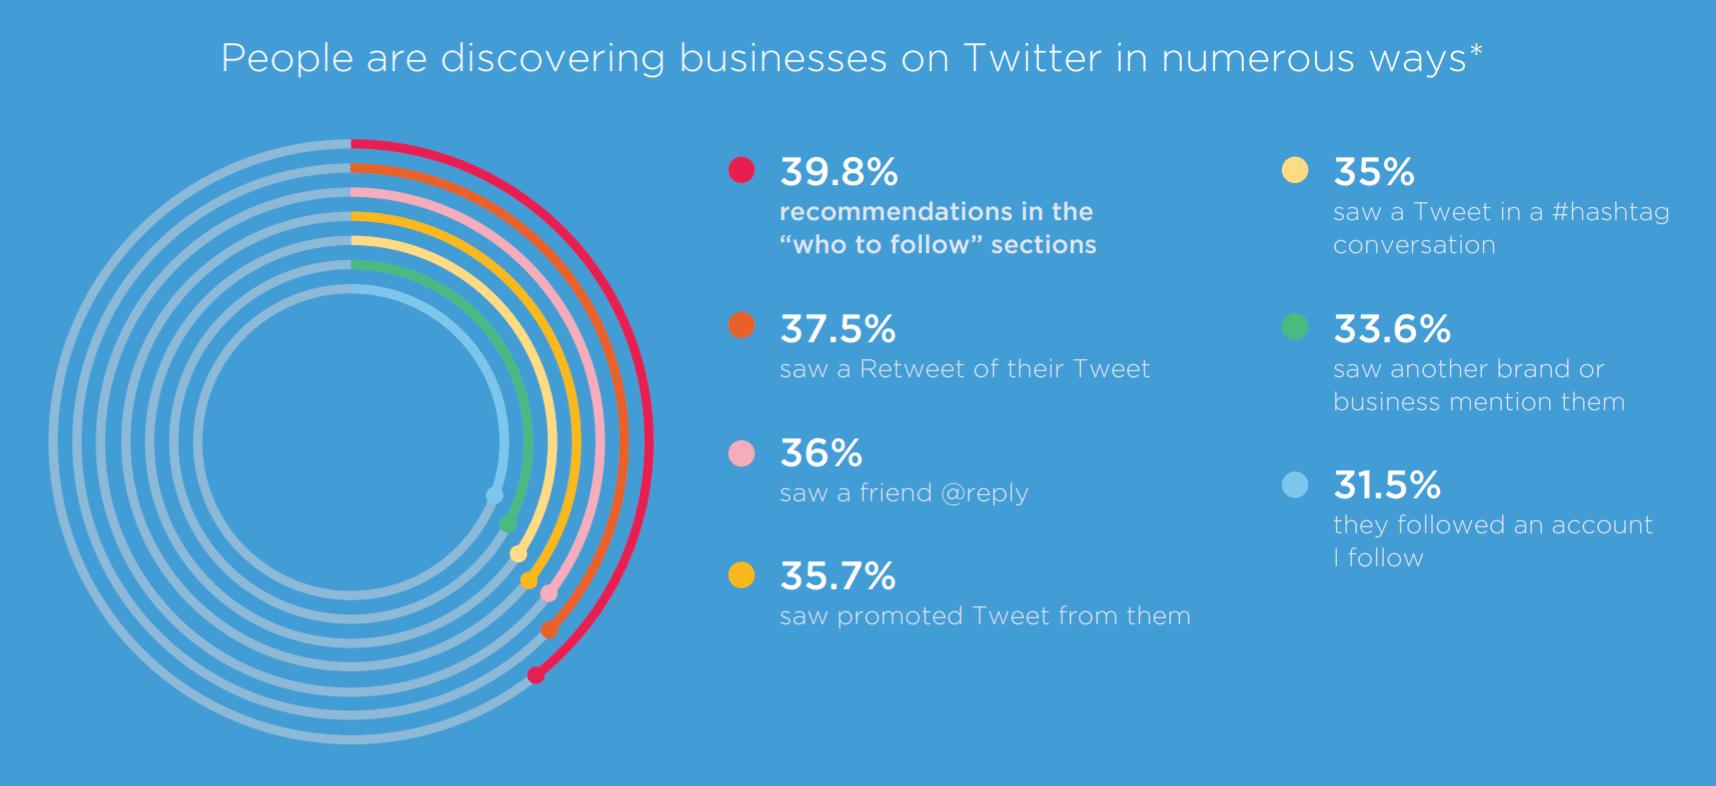 Descobrindo marcas no Twitter